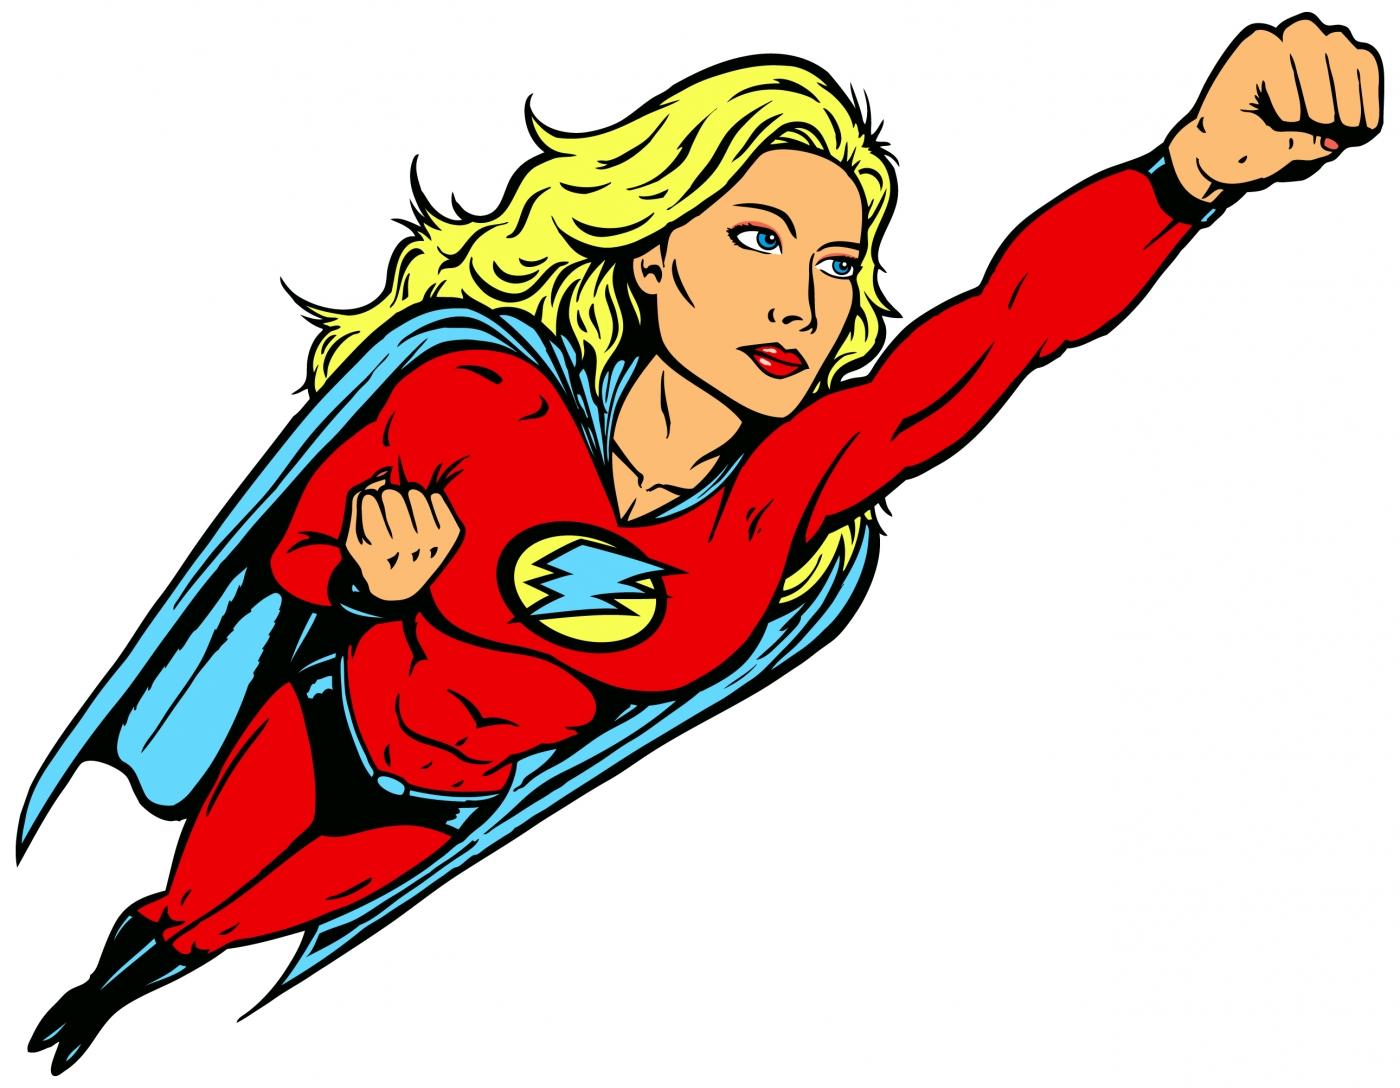 #superherobeauty from Grant Industries